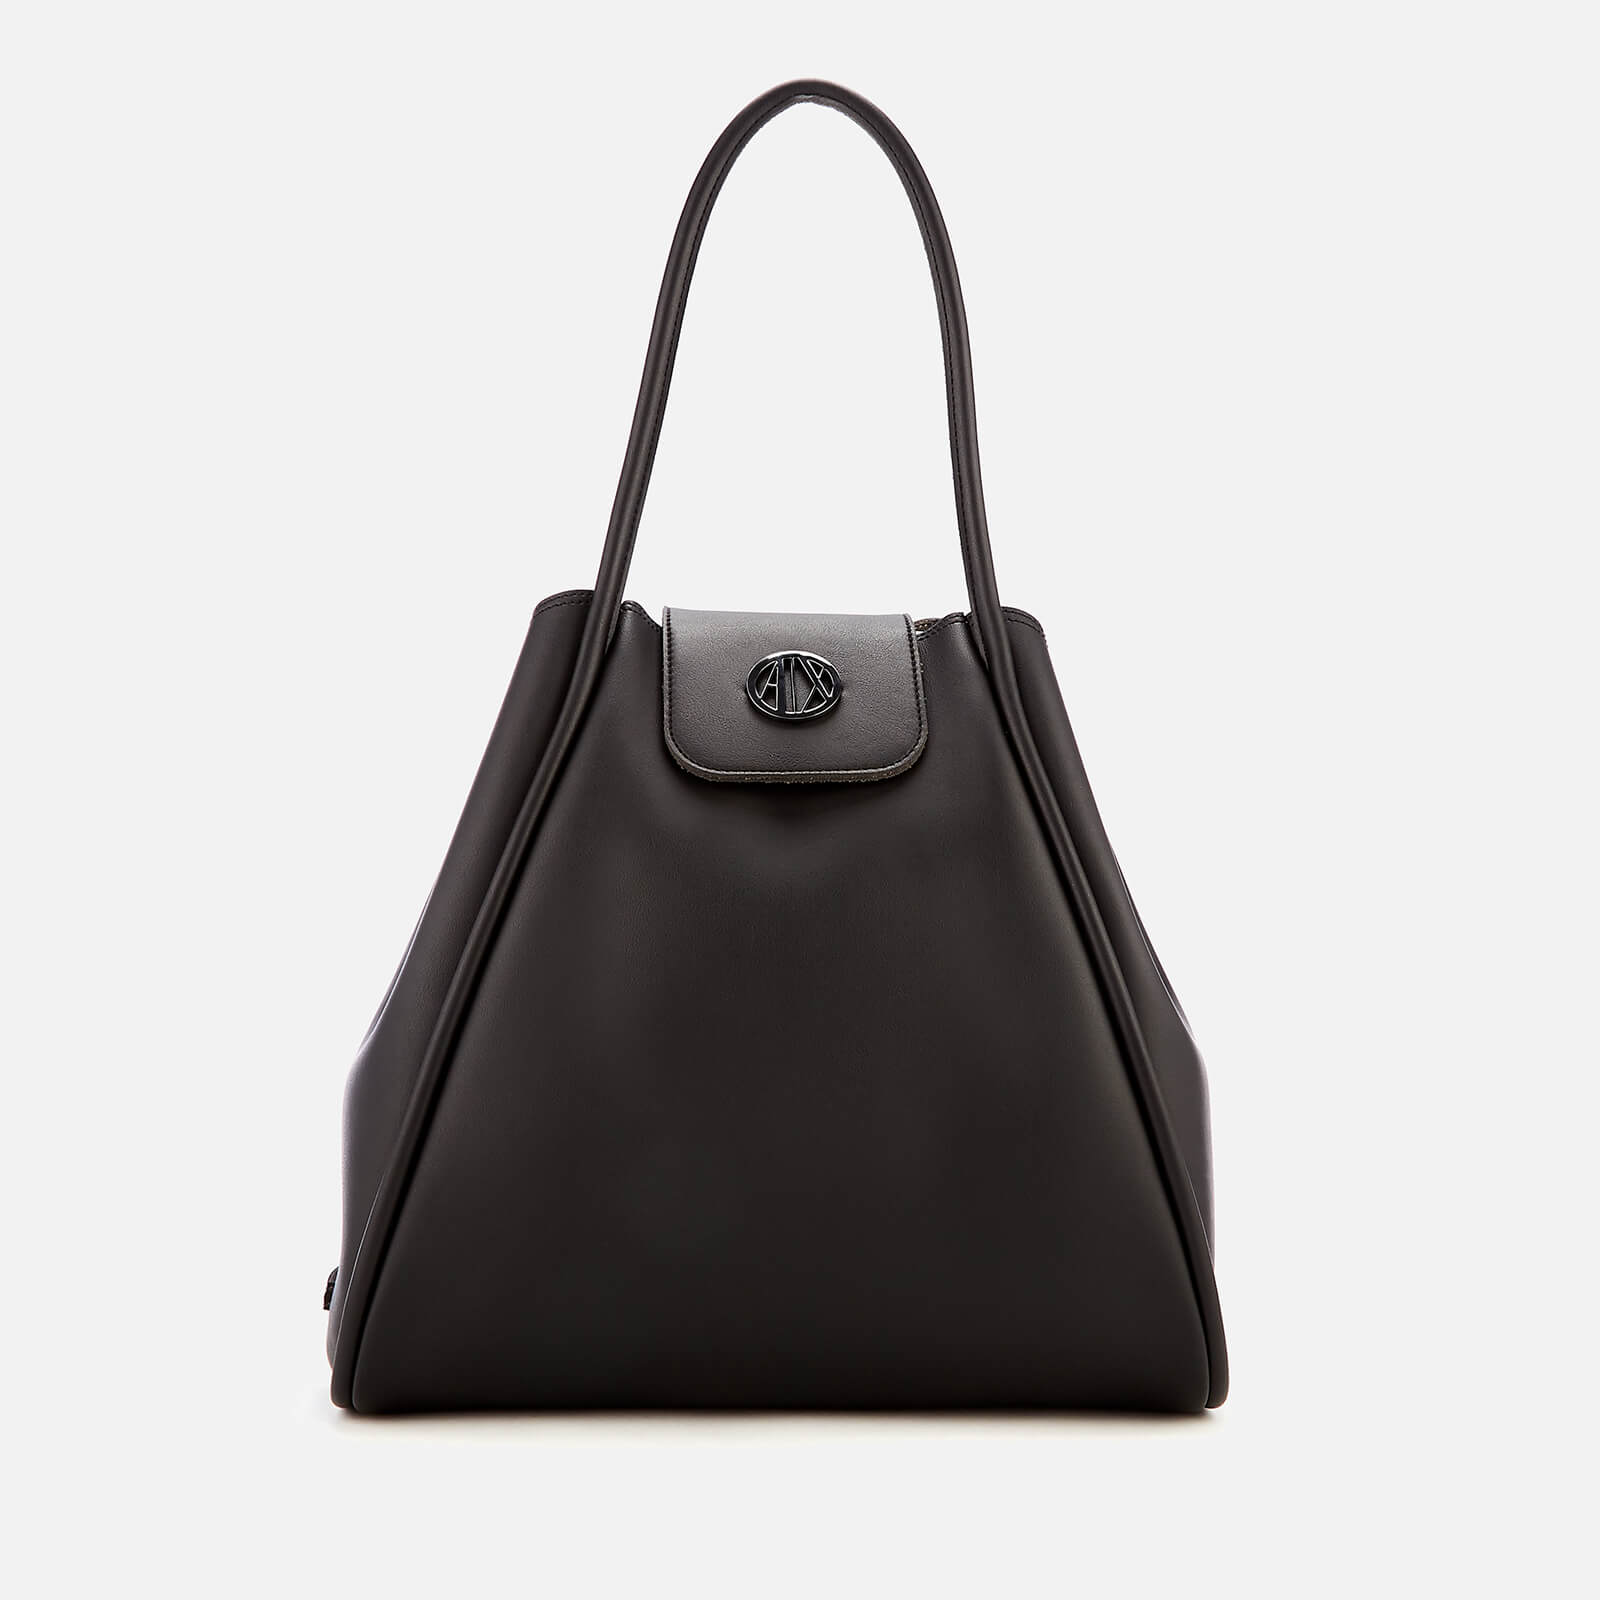 f6d1285e861110 Armani Exchange Women's Medium Shopper Tote Bag with Logo Flap - Black  Womens Accessories | TheHut.com